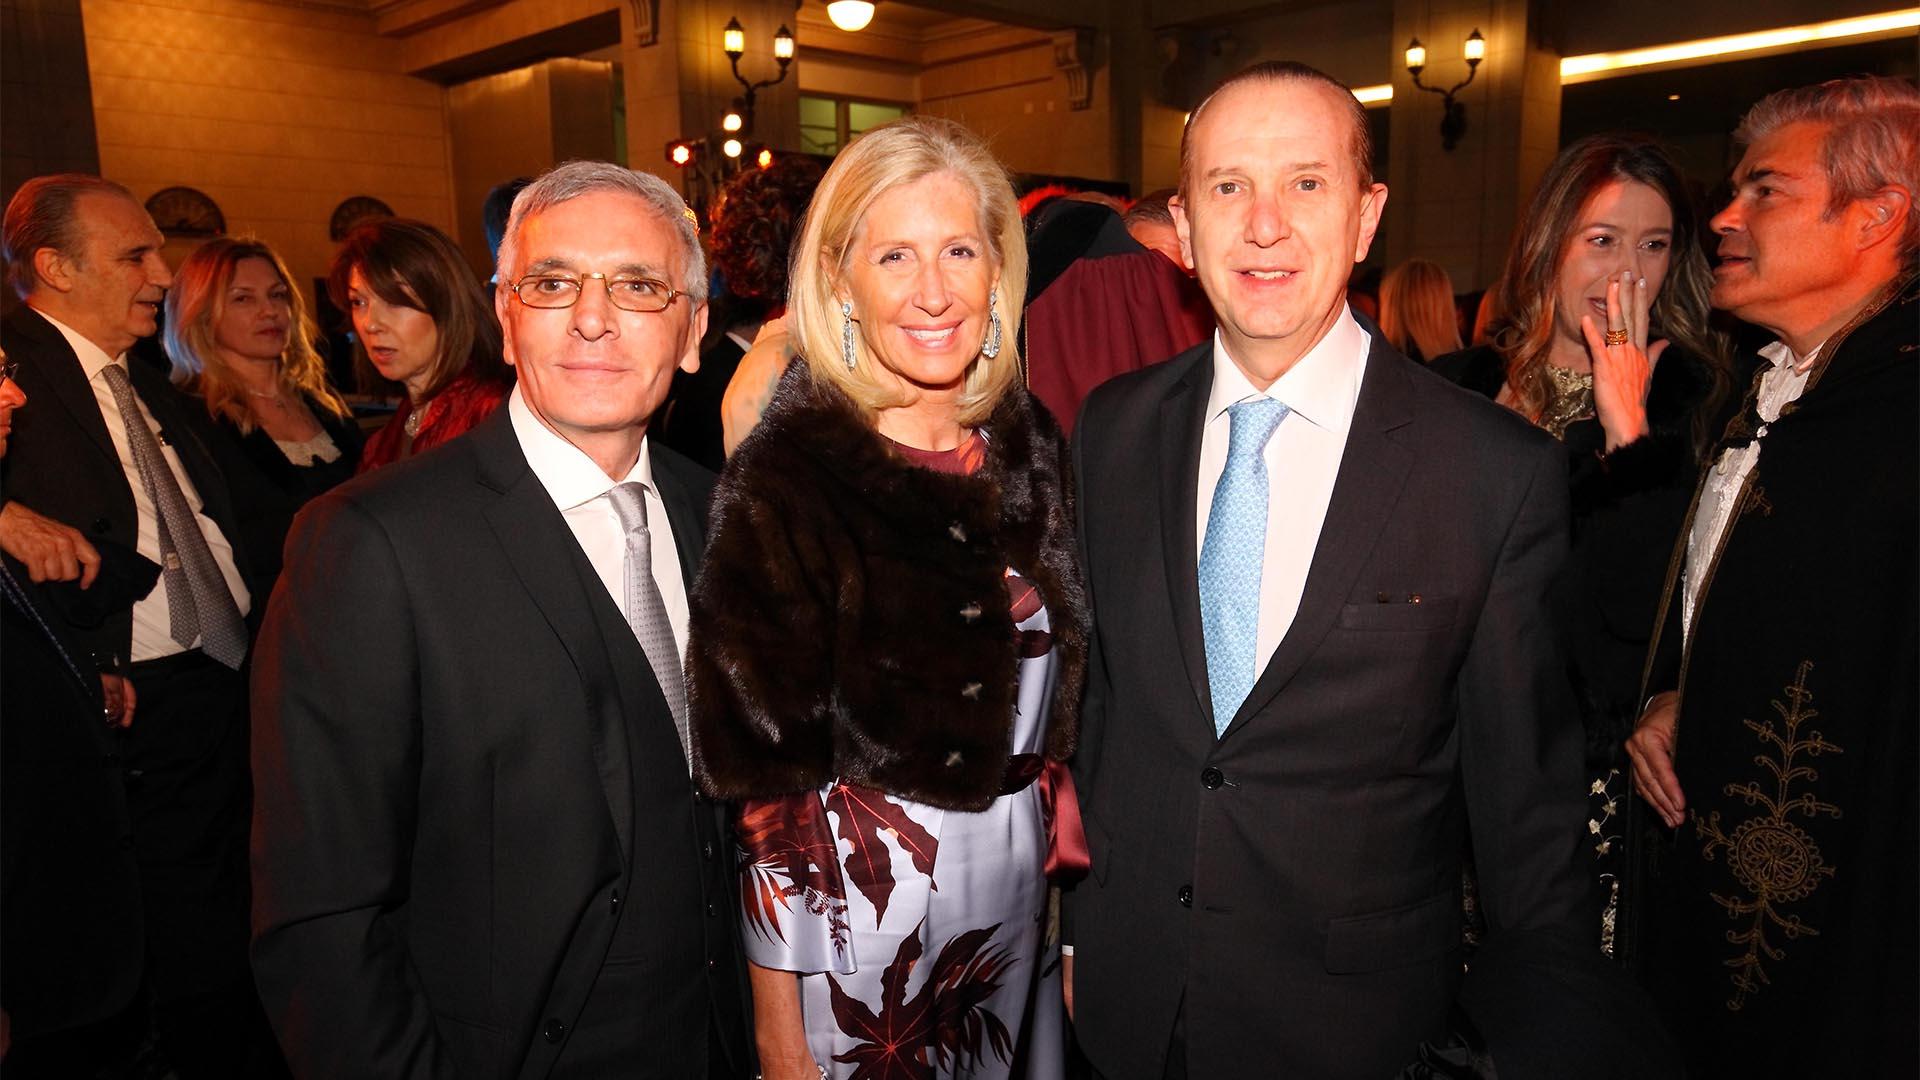 Esteban Tedesco, Érica Roberts y Sergio Baur